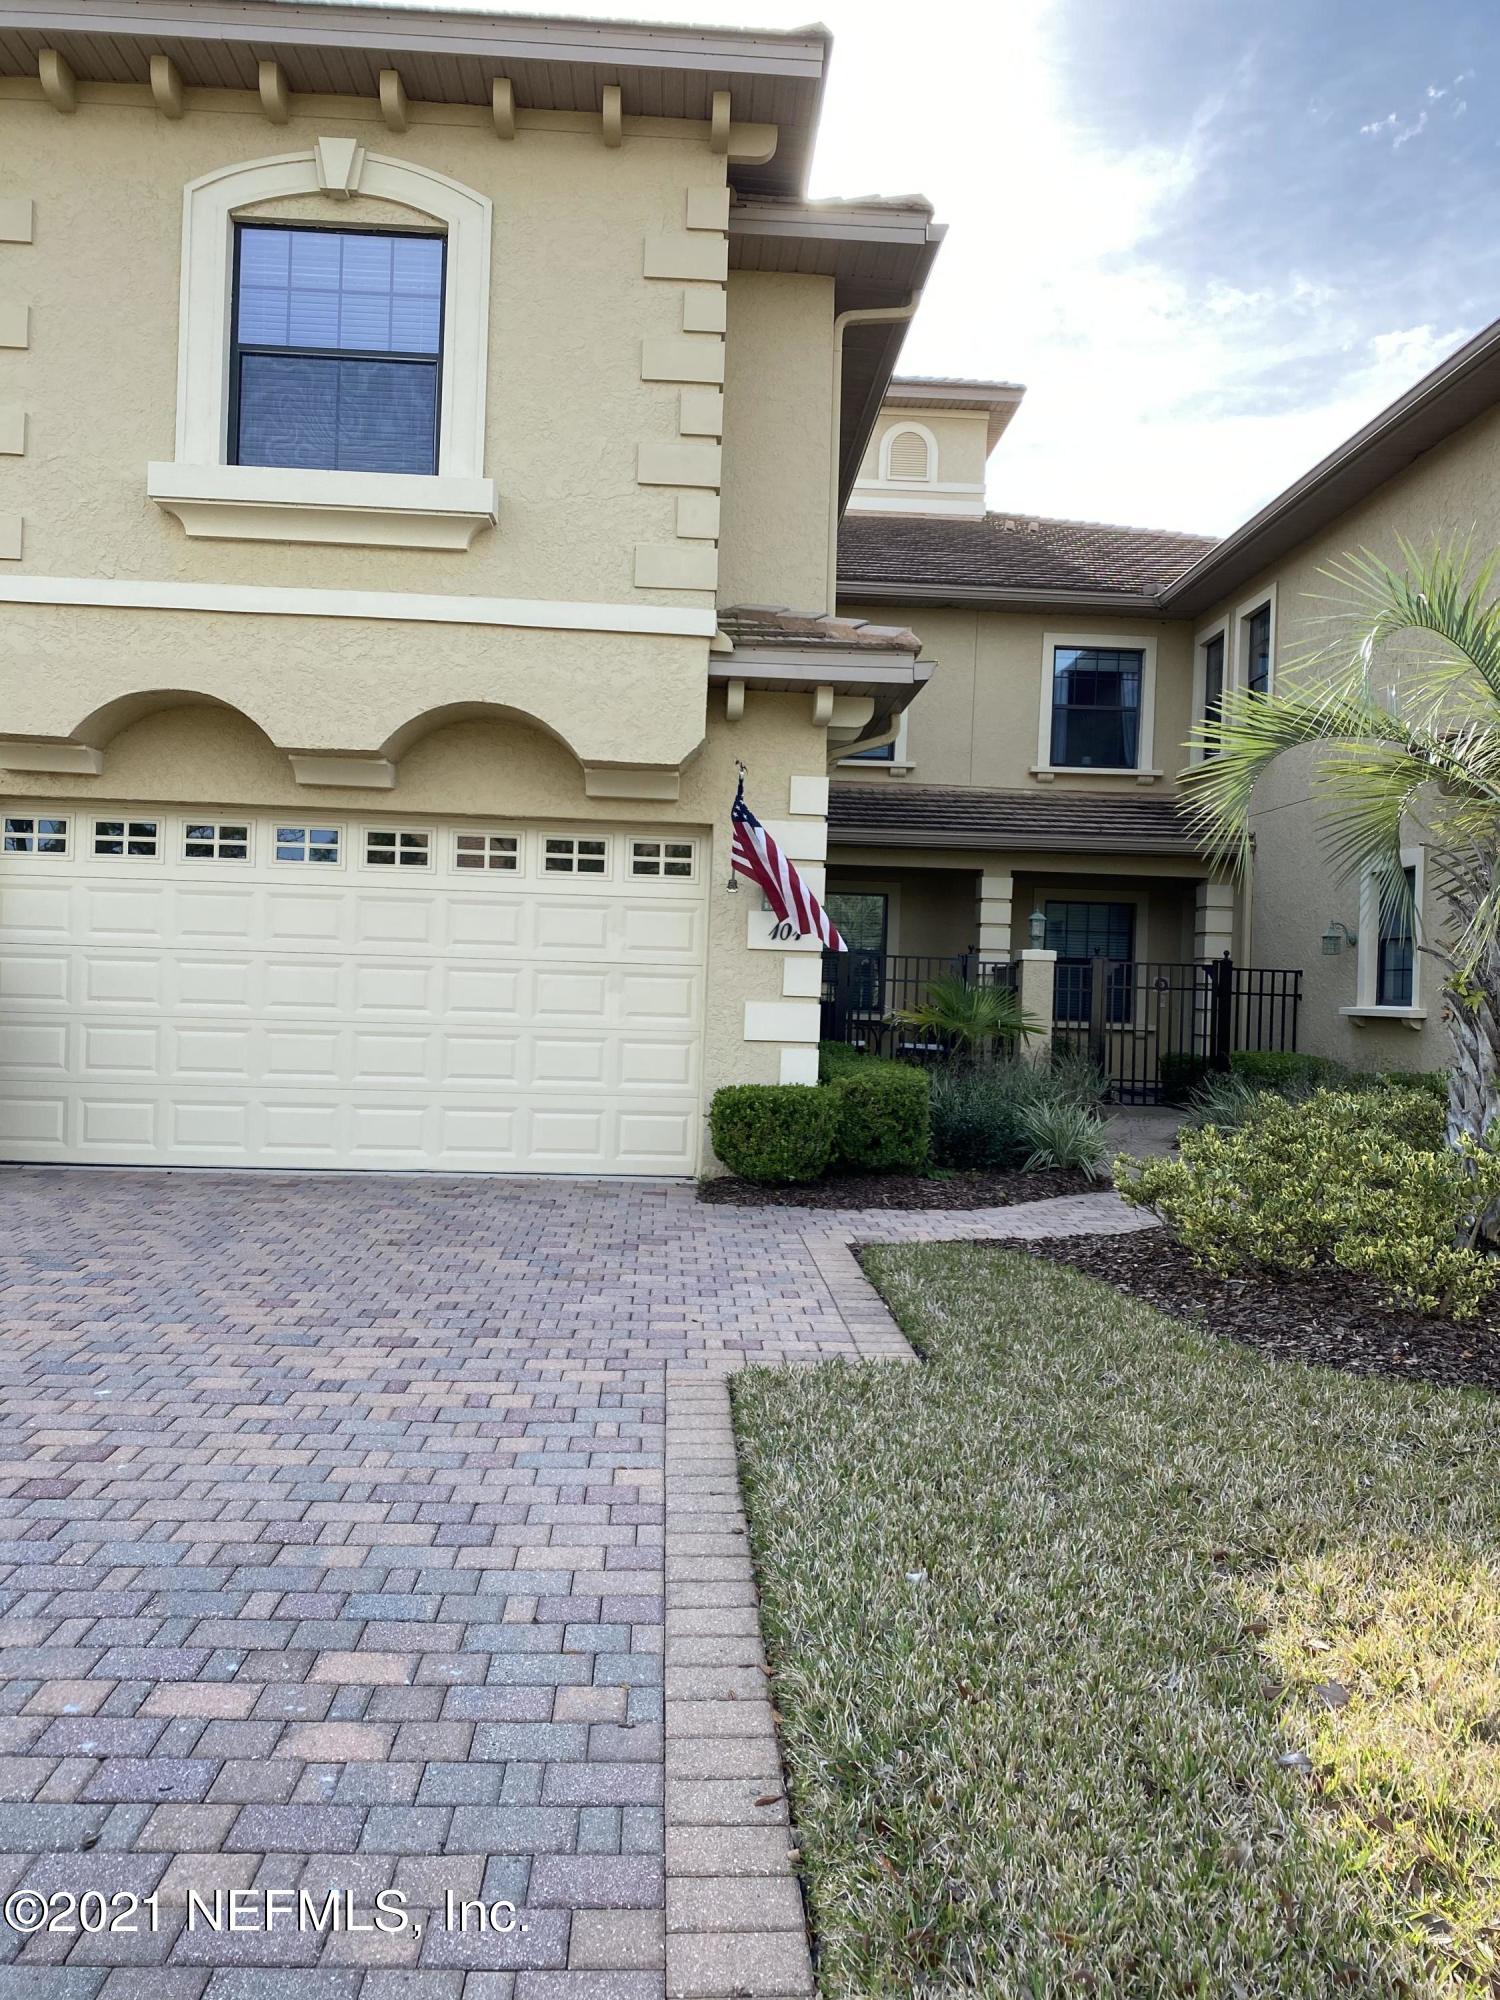 100 LATERRA LINKS, ST AUGUSTINE, FLORIDA 32092, 2 Bedrooms Bedrooms, ,2 BathroomsBathrooms,Residential,For sale,LATERRA LINKS,1097139